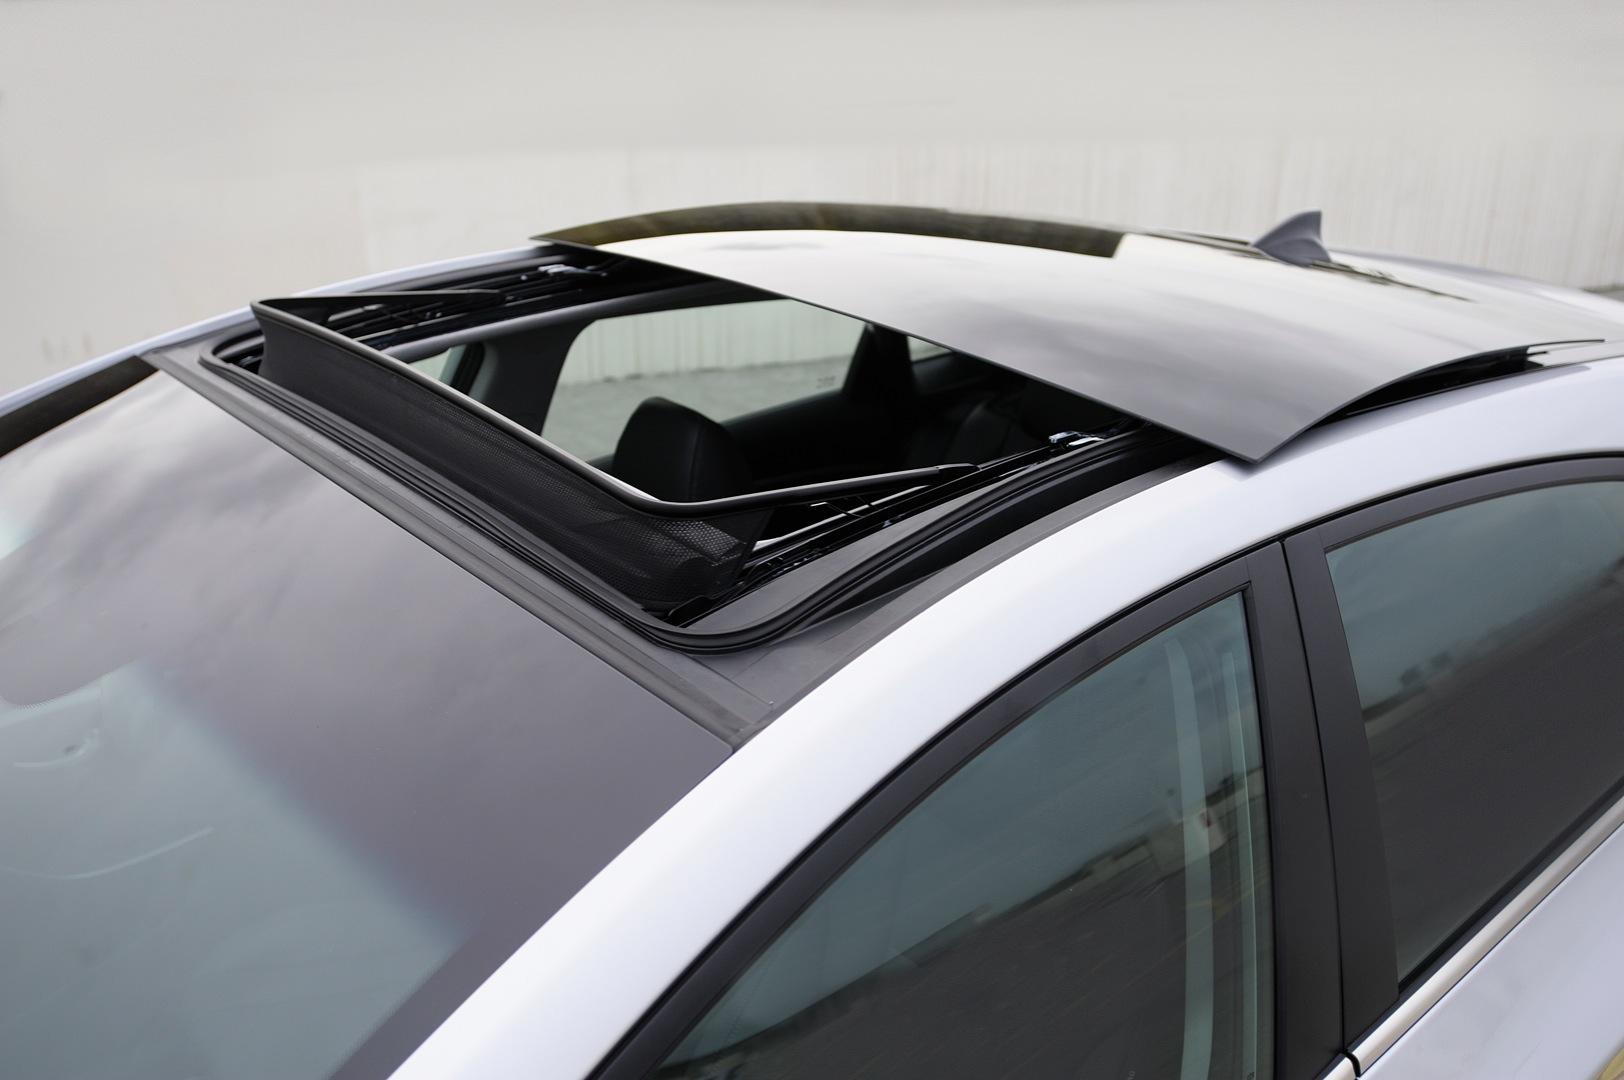 Hyundai Elantra 2012 Model >> HYUNDAI Elantra GT specs - 2012, 2013, 2014, 2015, 2016, 2017, 2018 - autoevolution